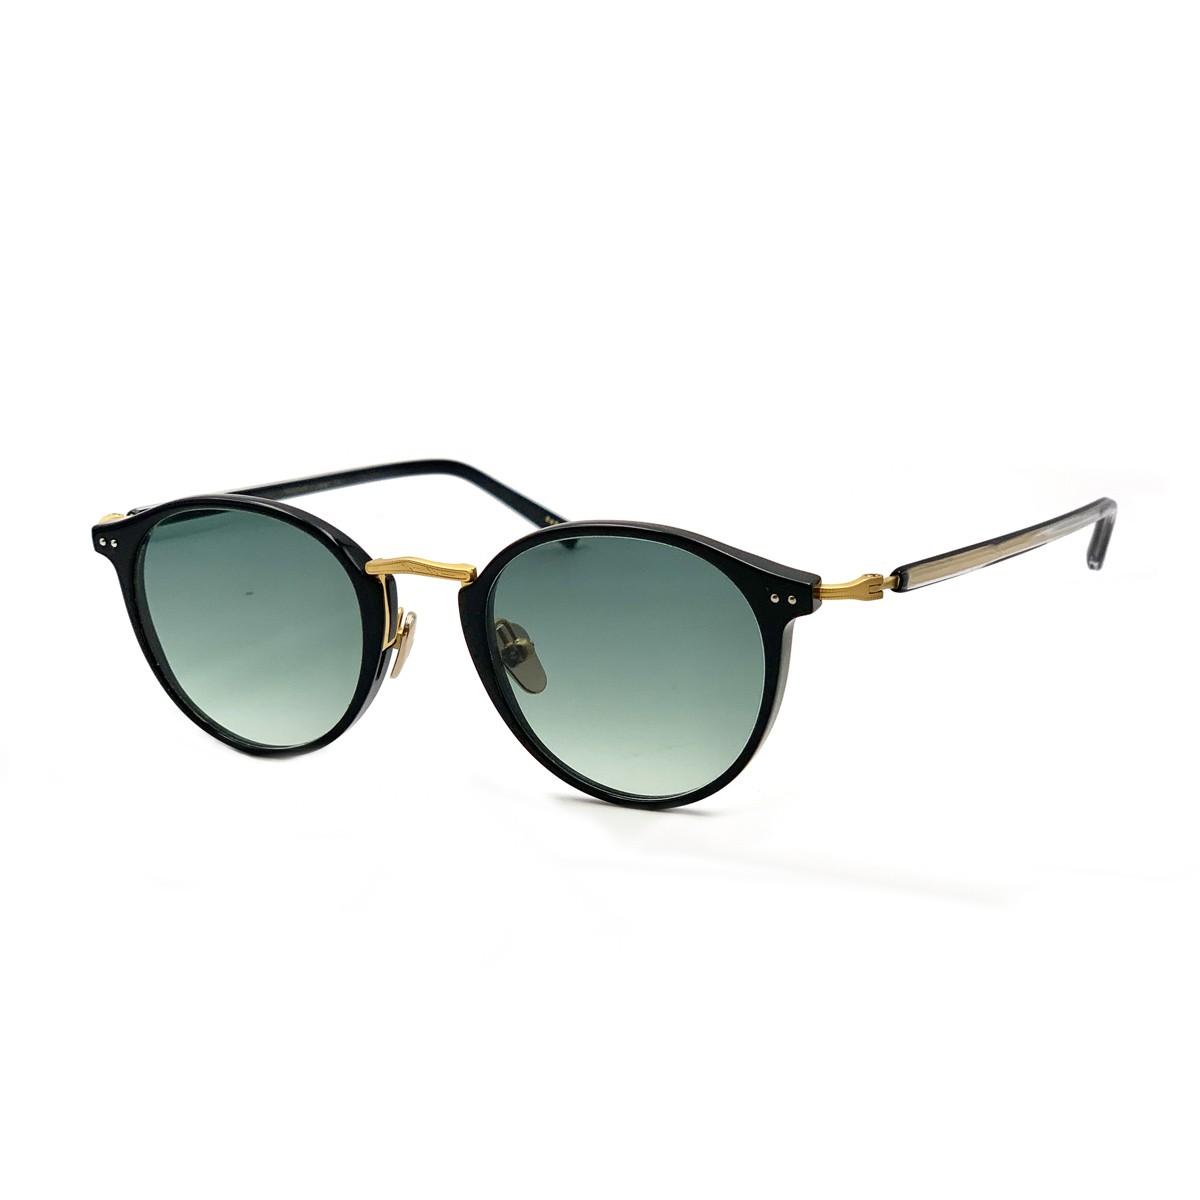 Masunaga GMS-819 | Men's sunglasses